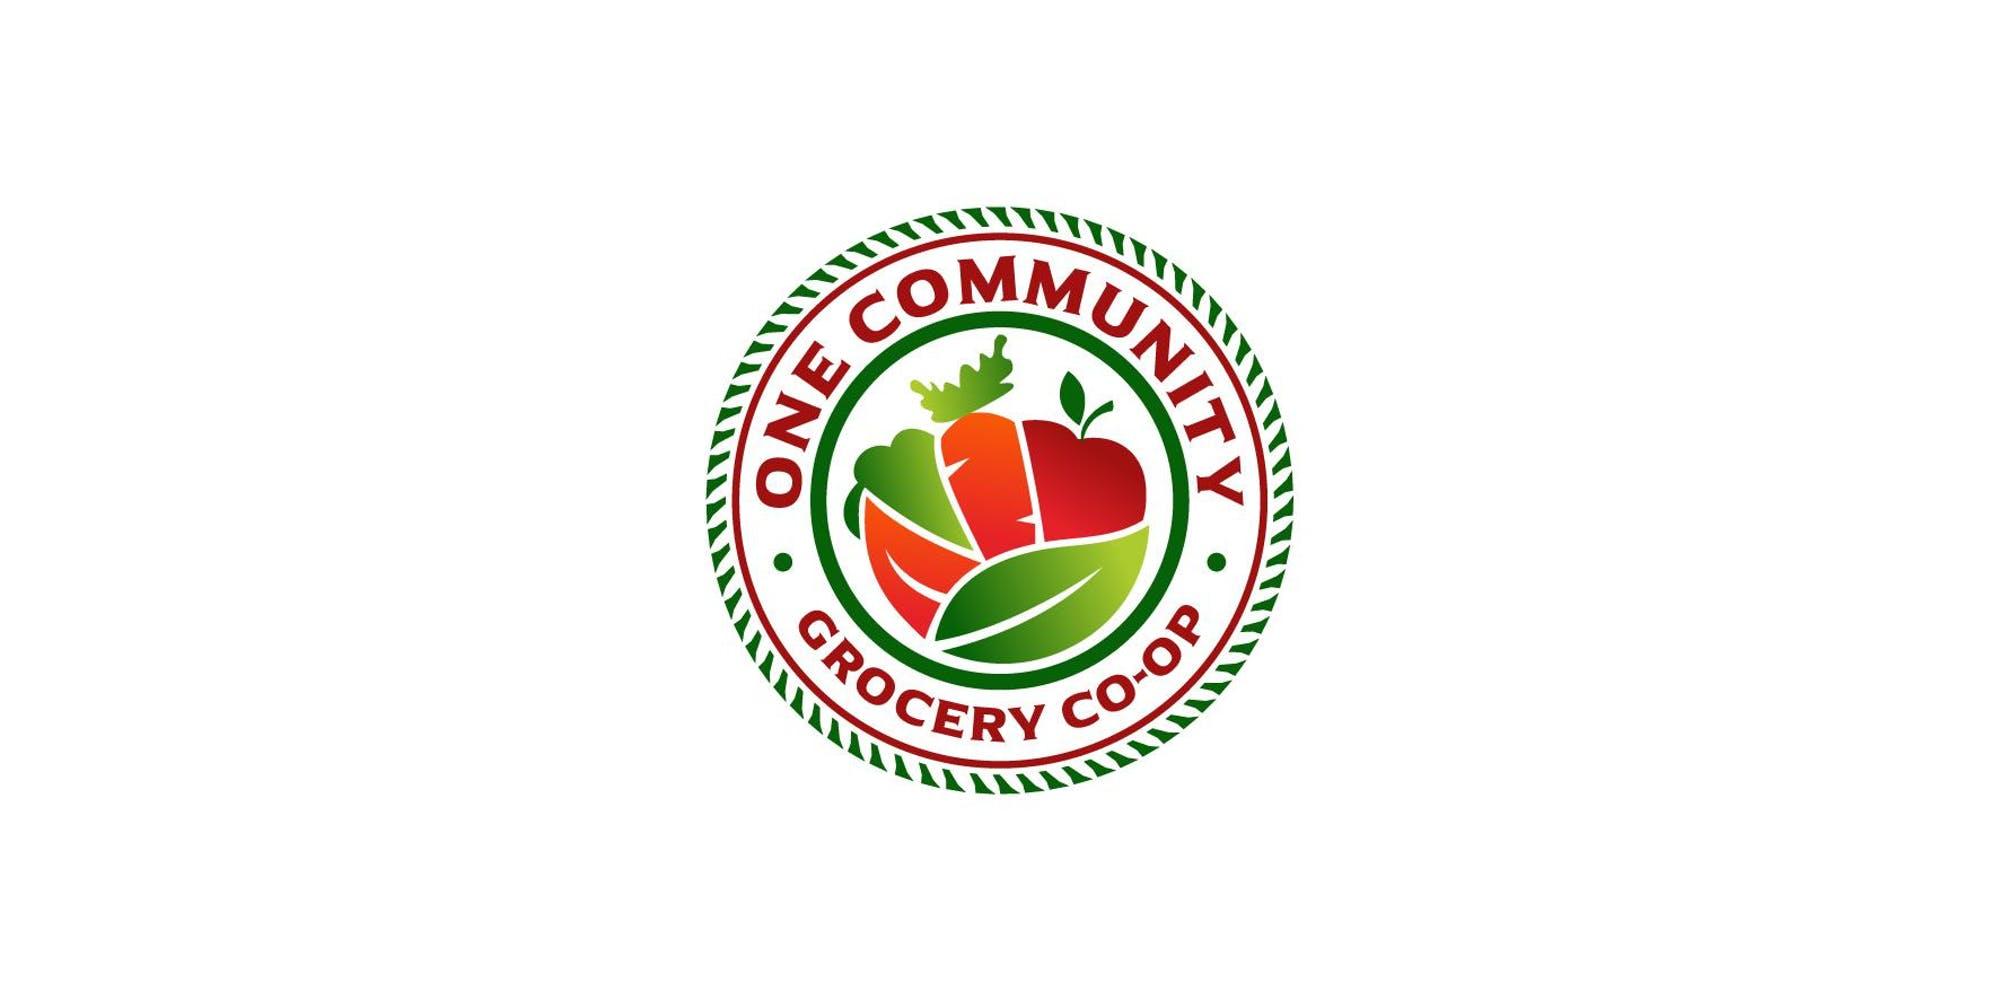 OneCommunitygrocerycoop.jpg